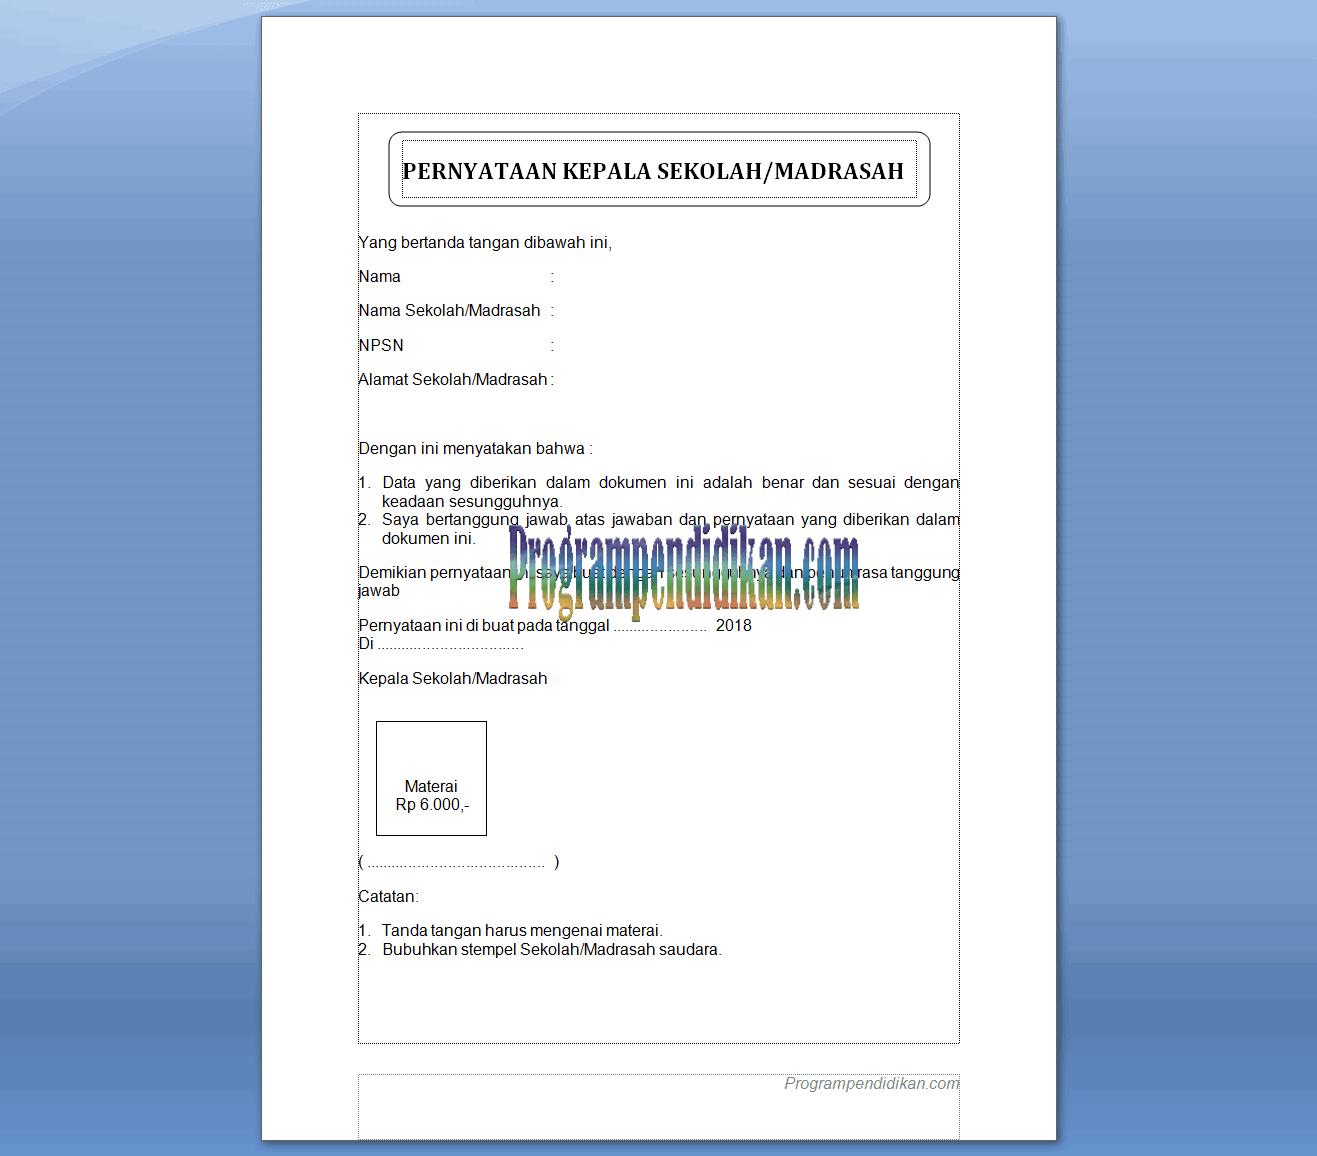 Surat Pernyataan Kebenaran Dokumen Akreditasi Tahun 2018